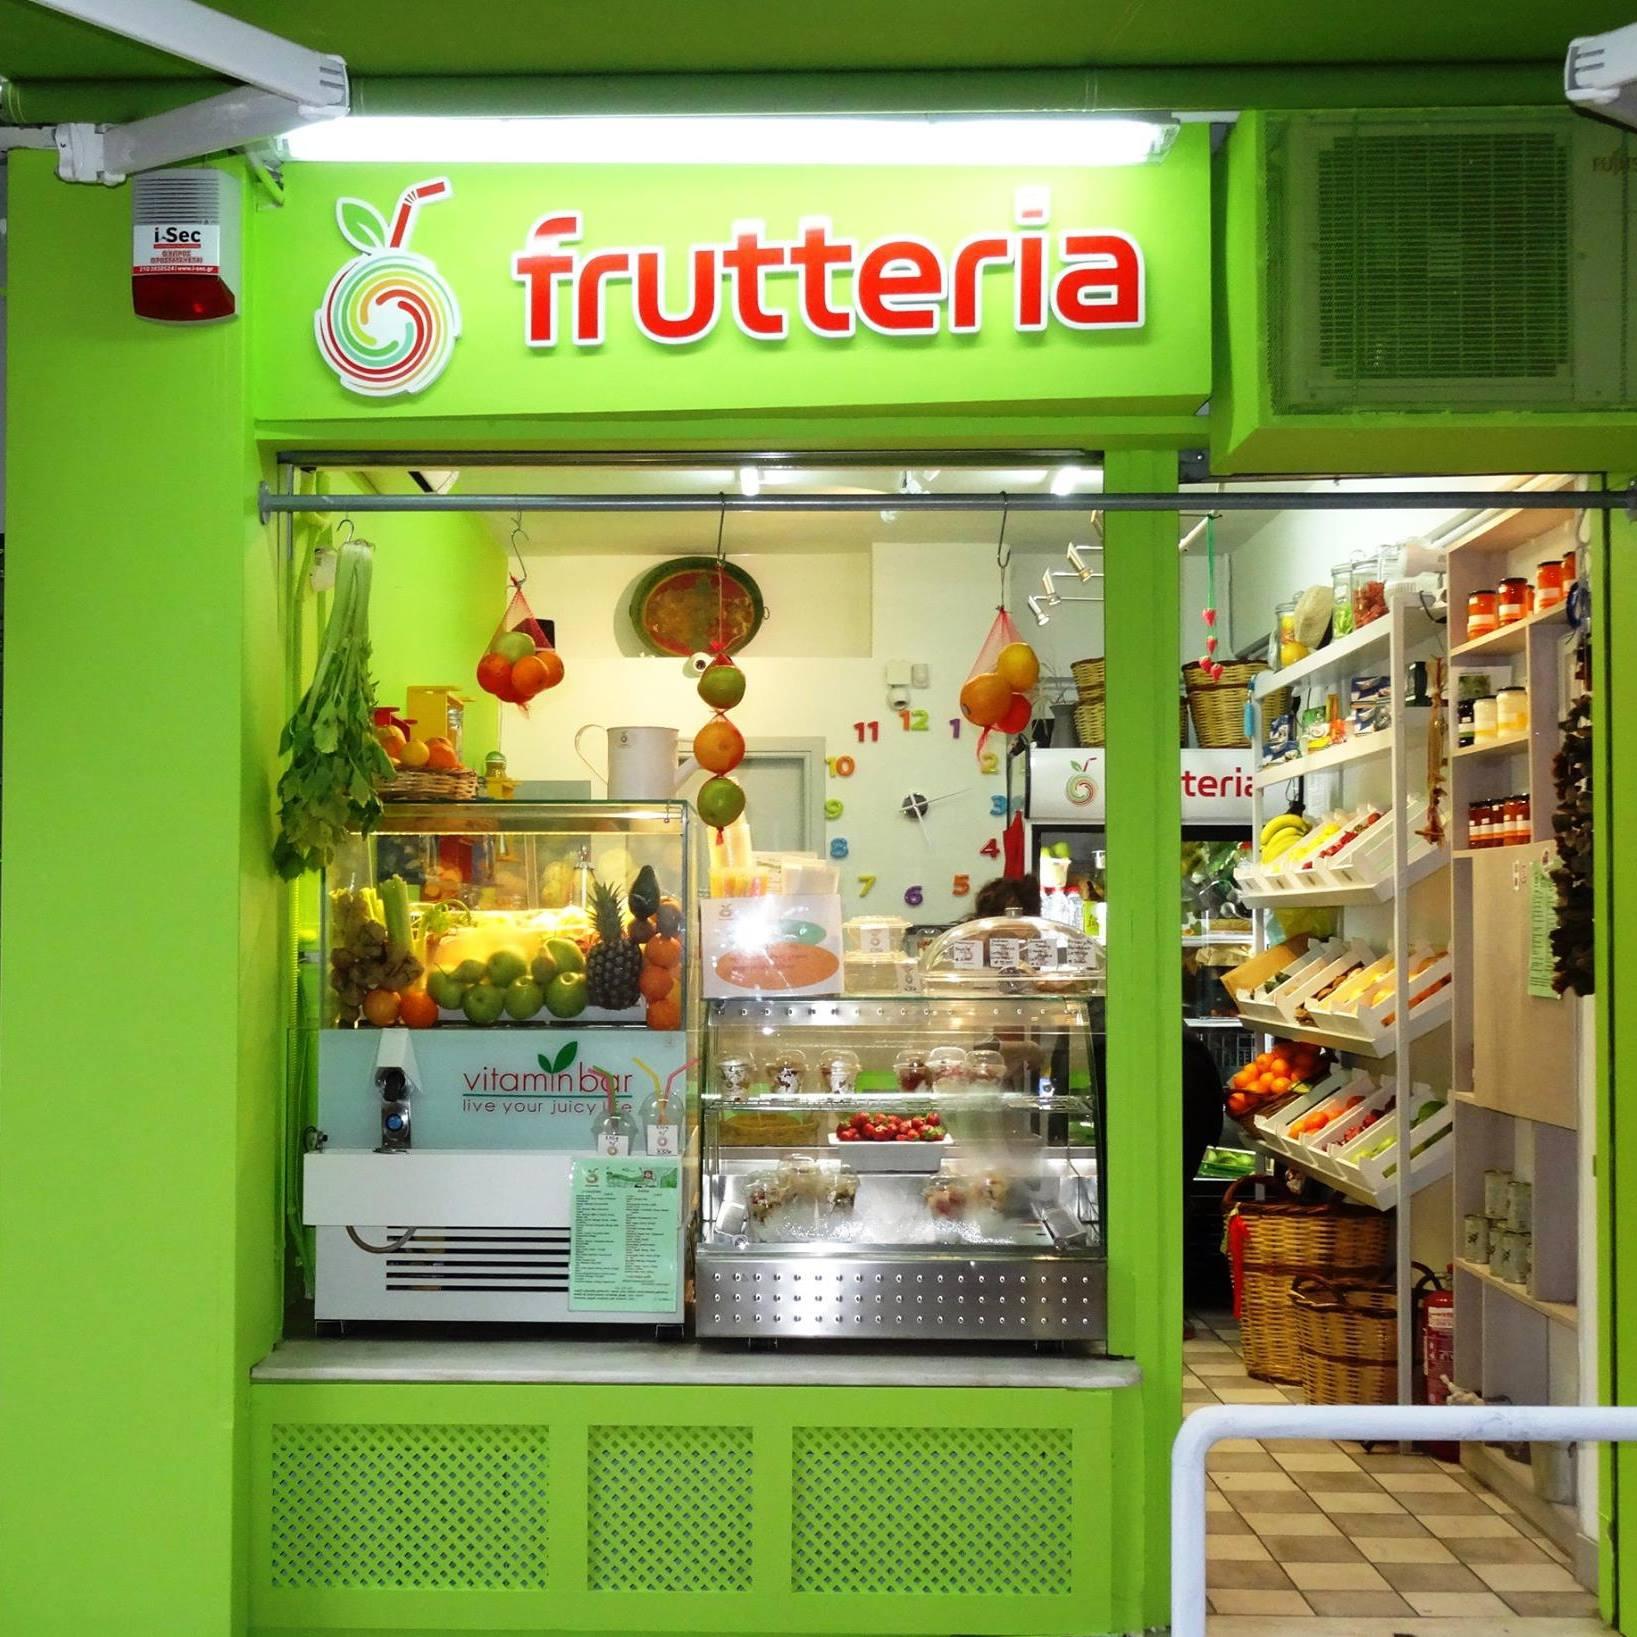 Frutteria is your fruit juice bar in Plaka (Photo credit:  @frutteria.gr / Facebook )